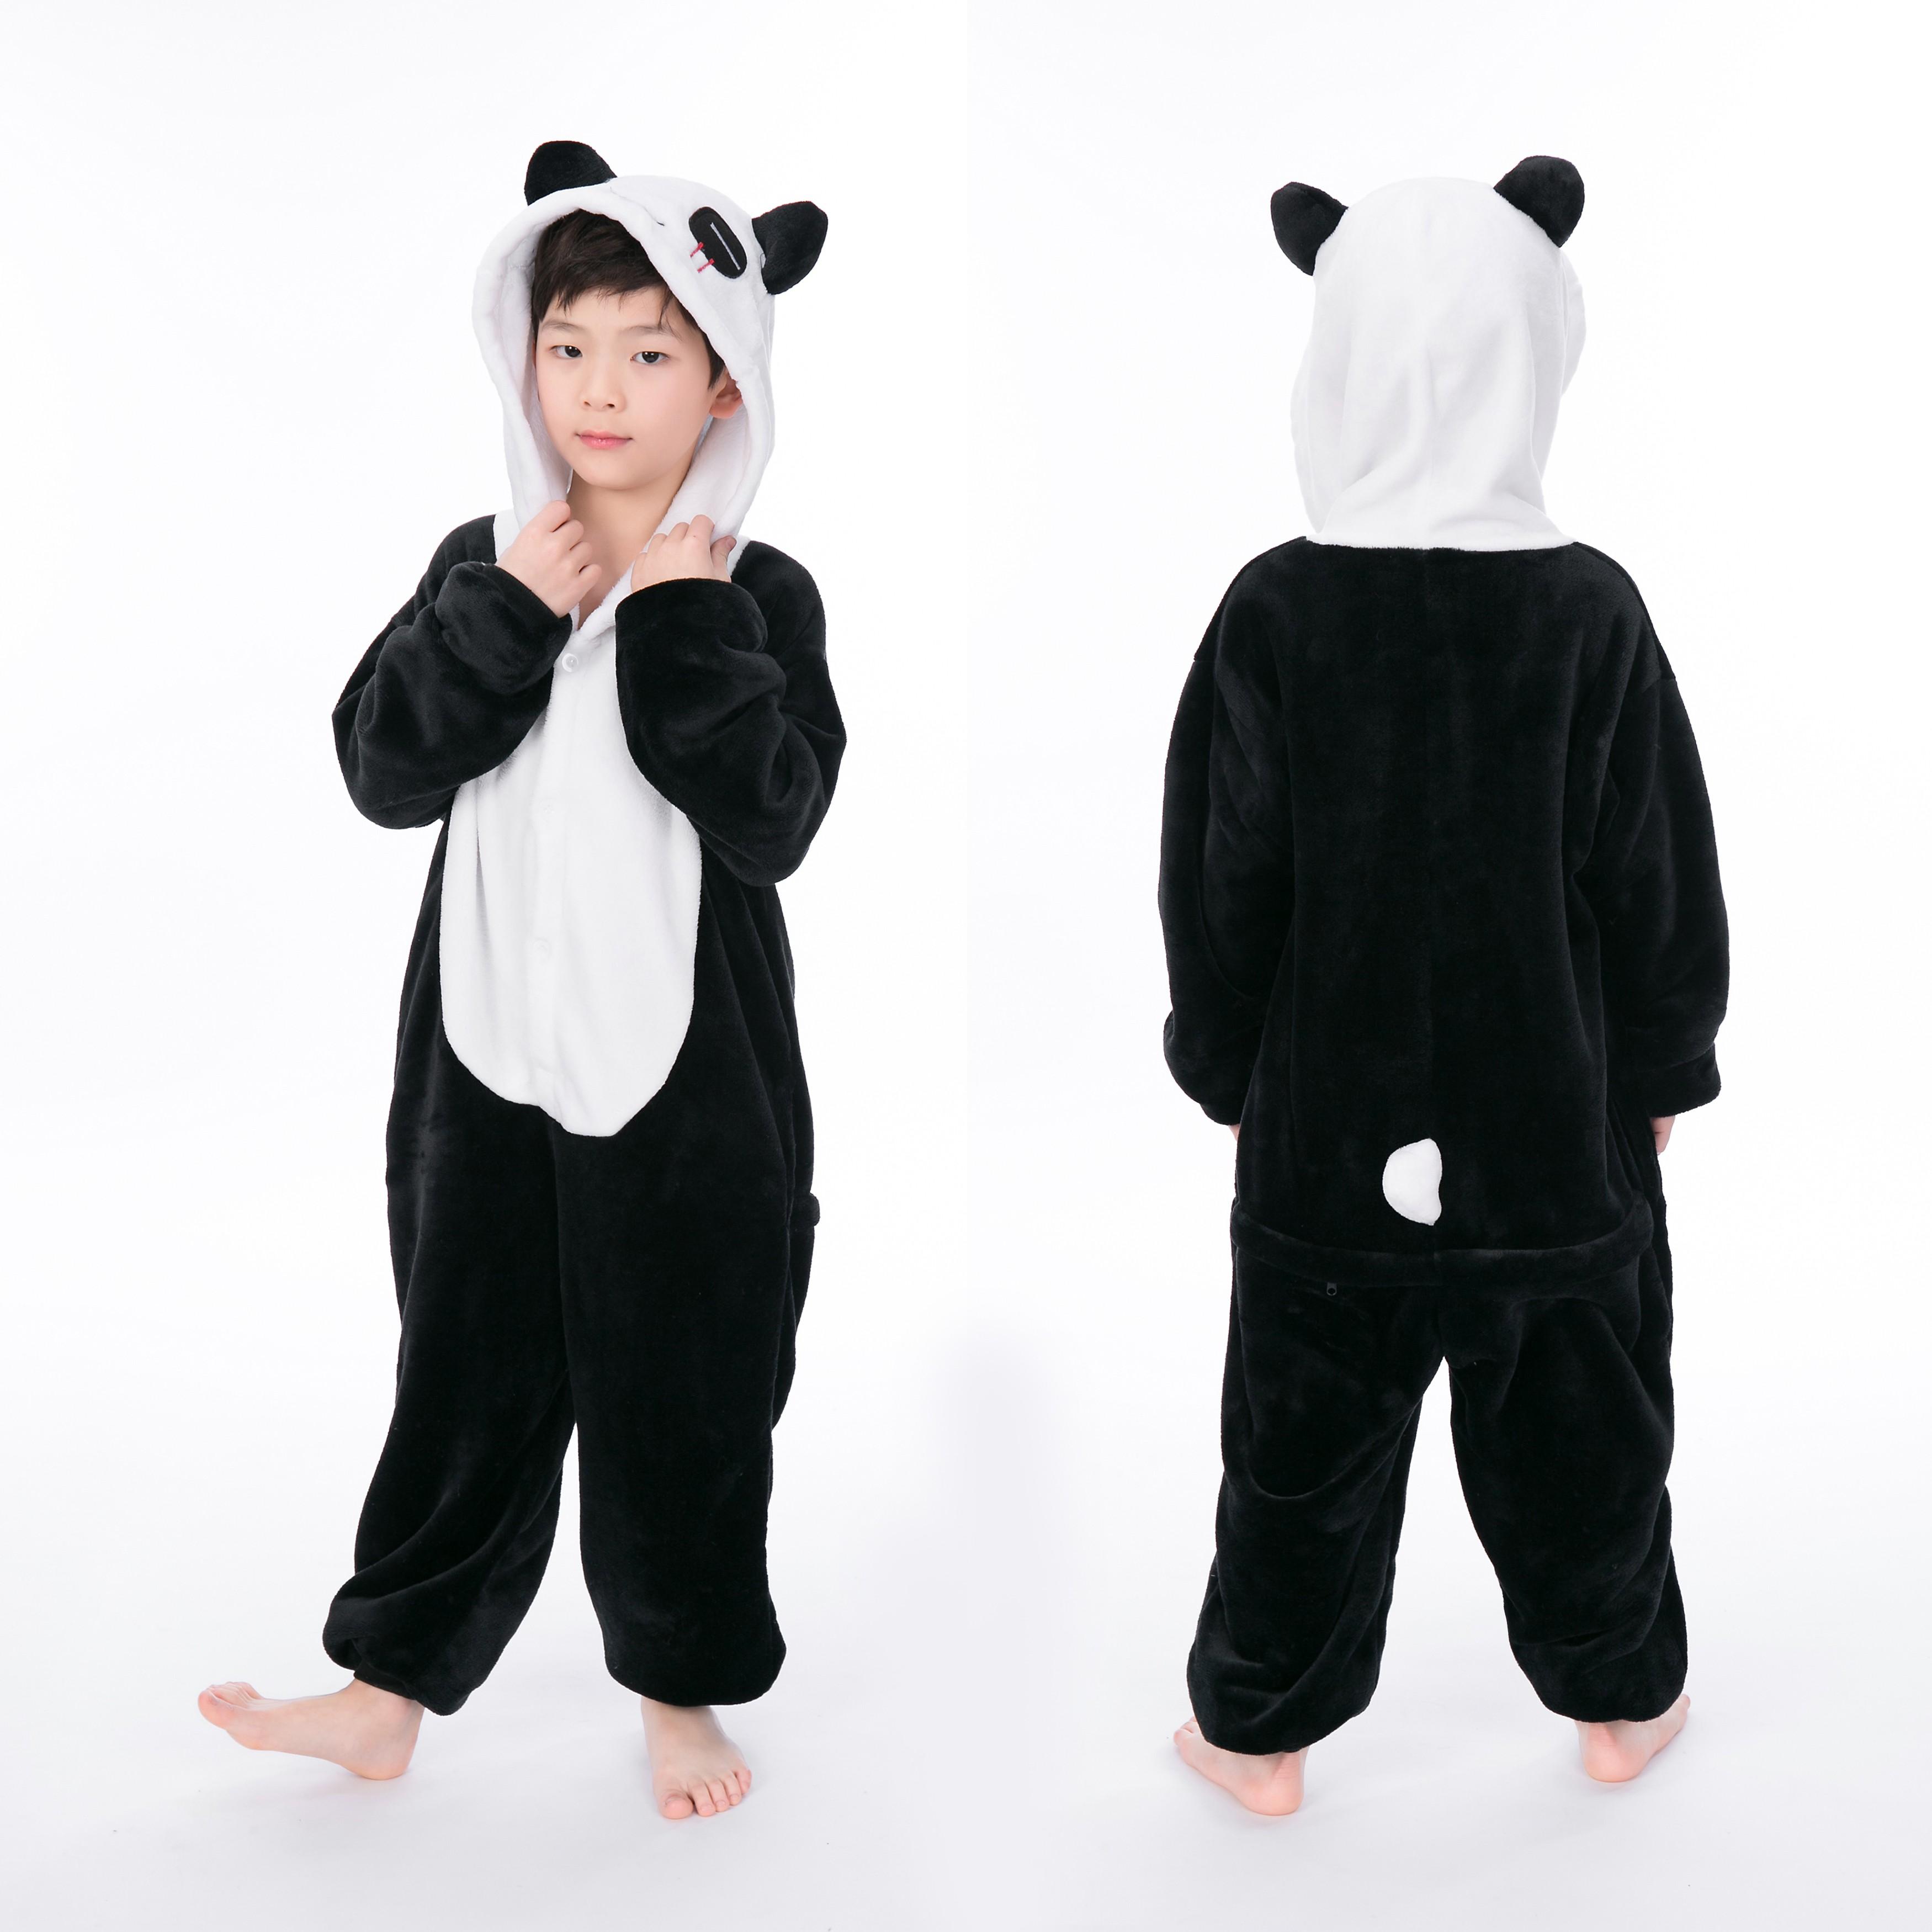 ad56b1777894 Panda Onesie for Kid Animal Kigurumi Pajama Halloween Party Costumes